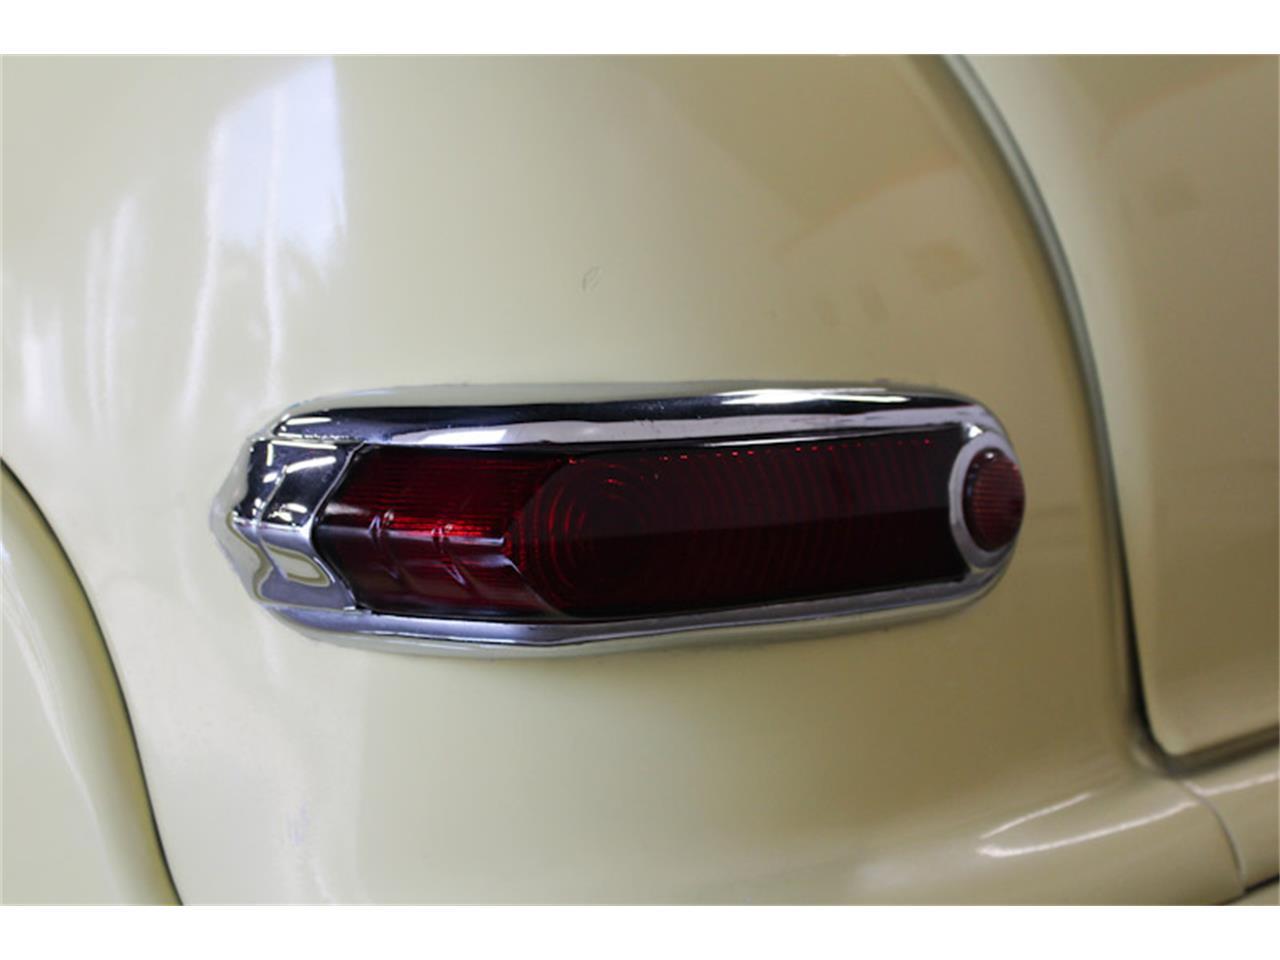 Large Picture of Classic '50 Mercury Hot Rod located in Fairfield California - OJFQ